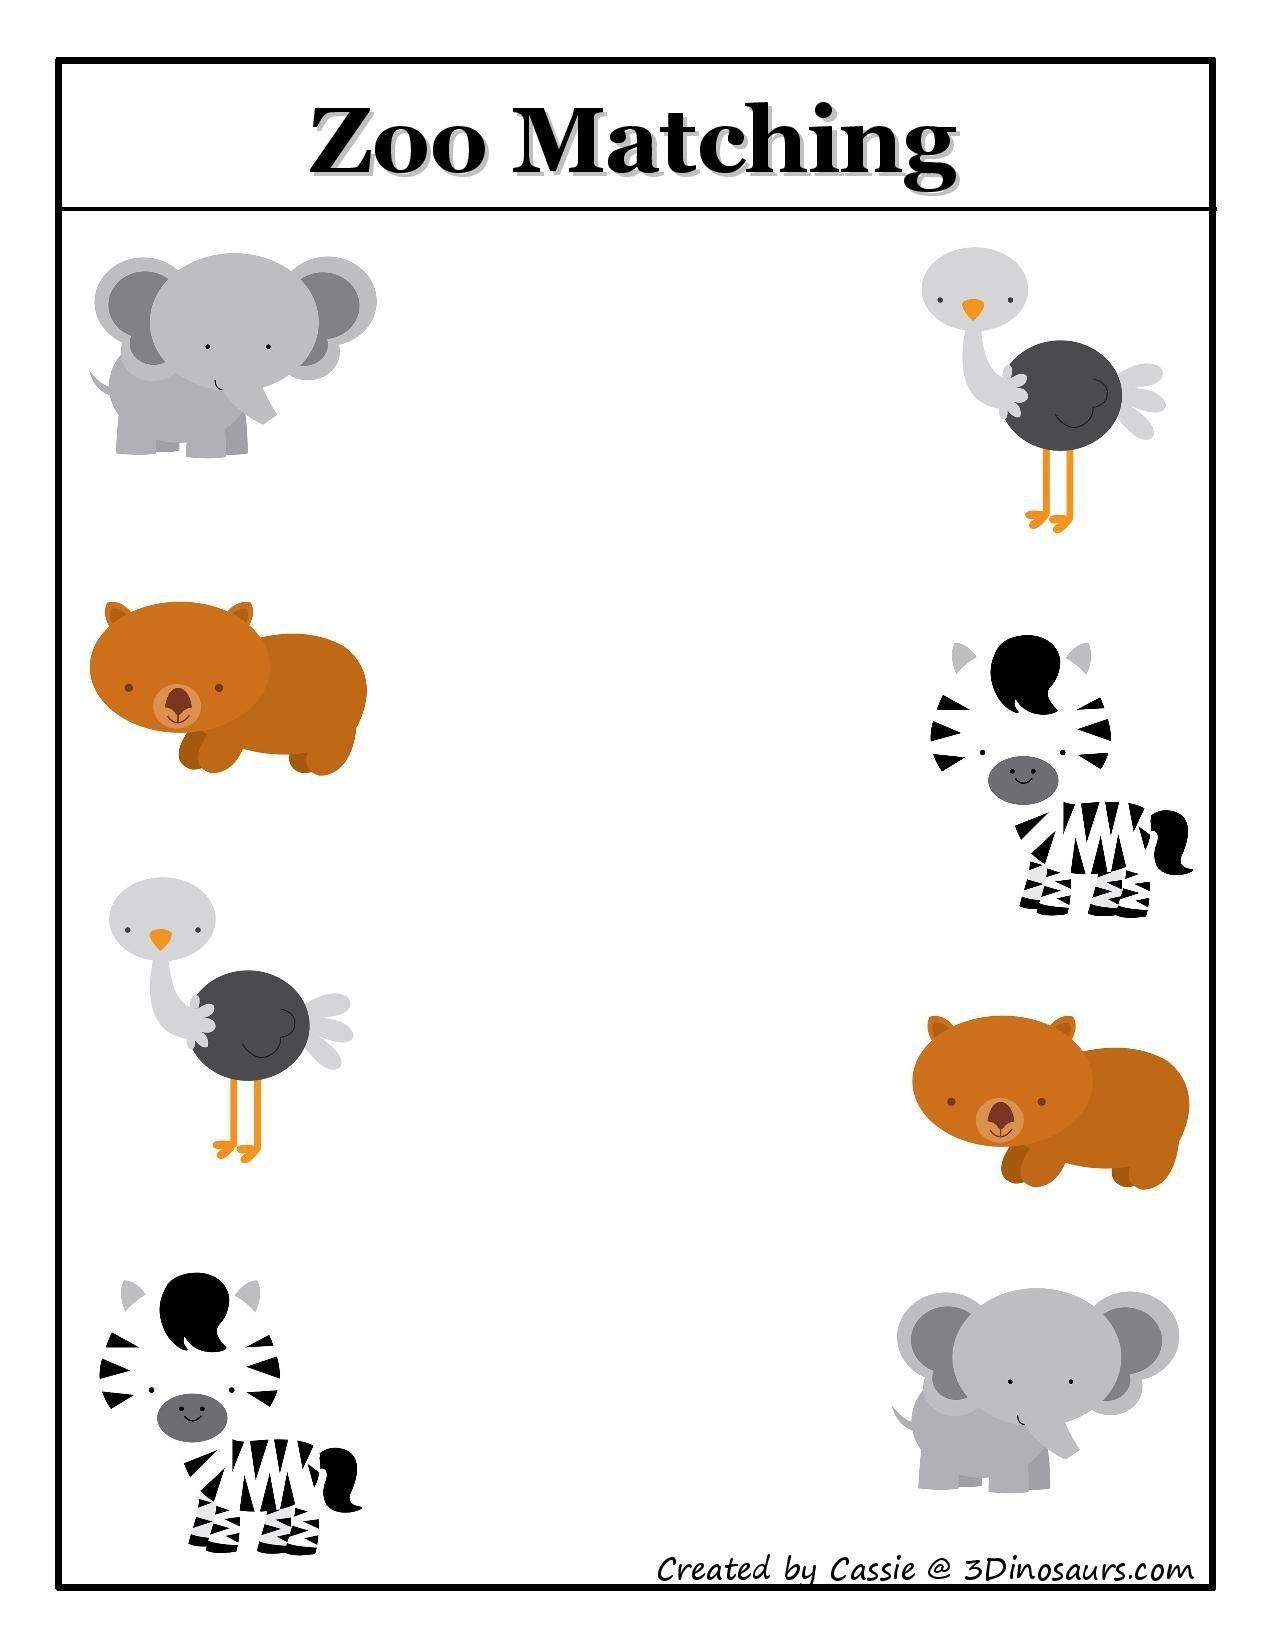 Pin By Denia Patricia Quesada V On Kinder Ideas Zoo Activities Fun Preschool Worksheets Preschool Zoo Theme [ 1650 x 1275 Pixel ]